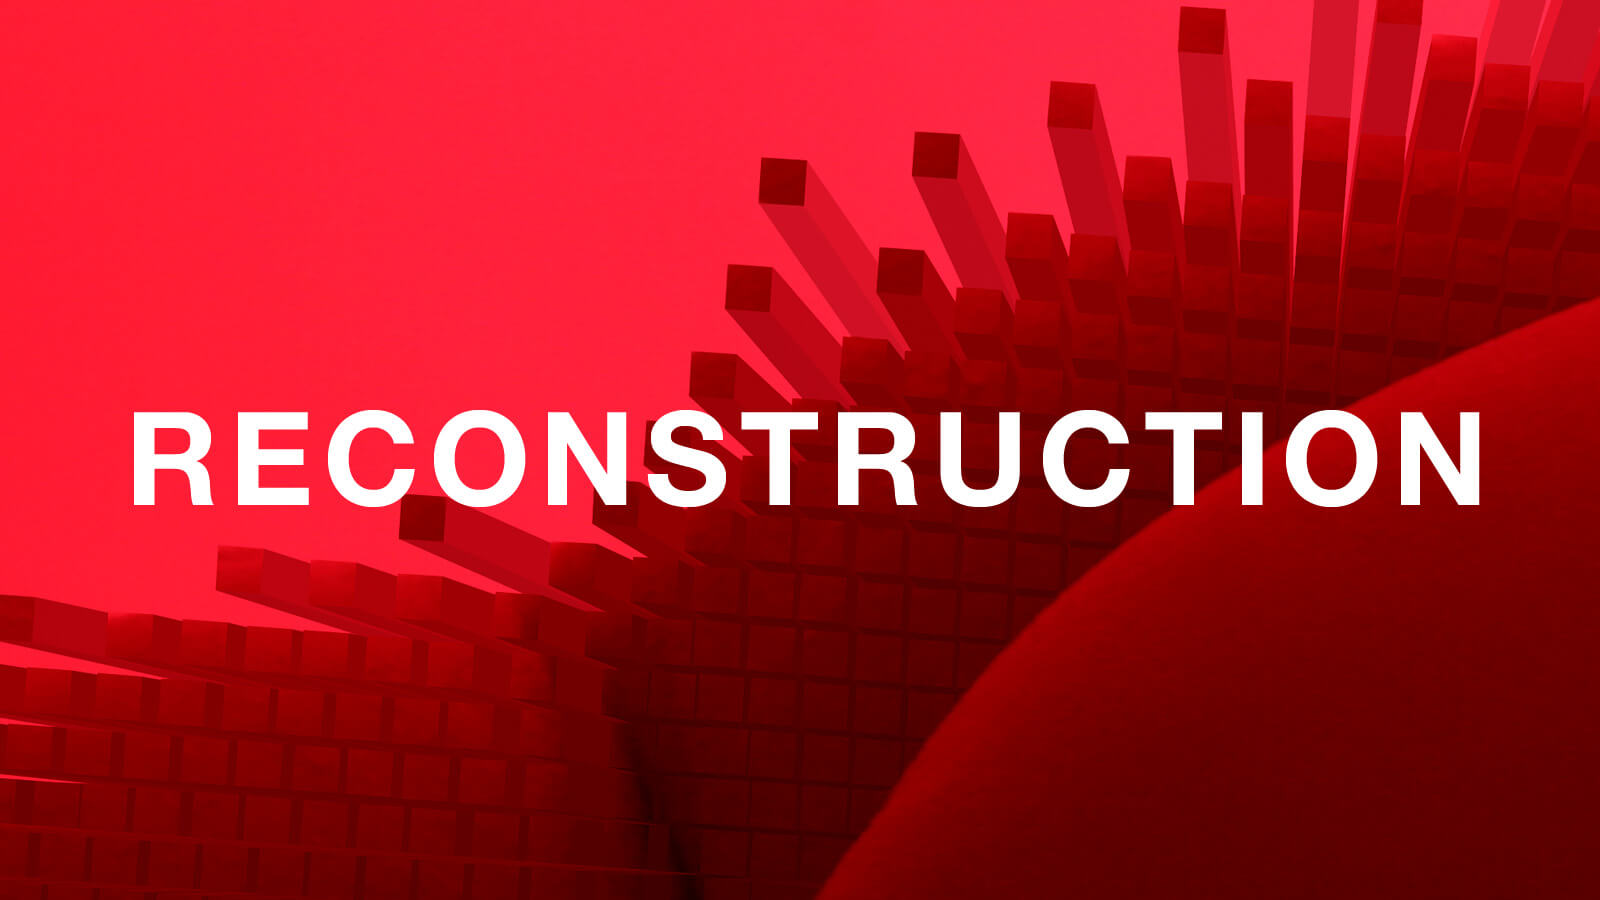 Hummo-reconstruction-Horno-Virtual-Gallery-Productos-Alimentacion-visual-galeria-arte-fotografia-artistica-decorativa-decoracion-exposicion